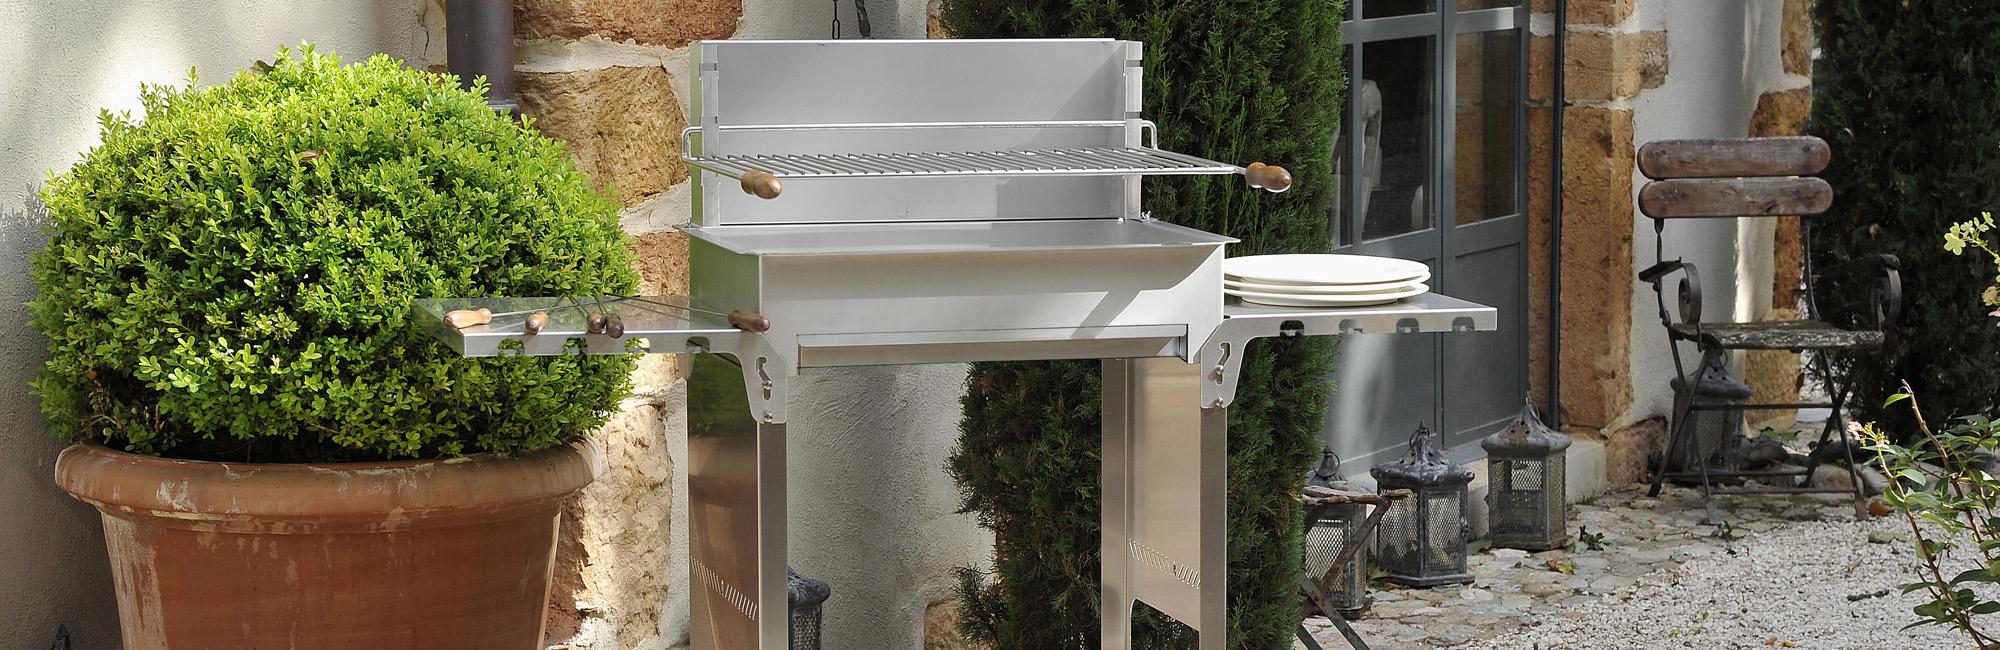 barbecue gaz fabrication francaise. Black Bedroom Furniture Sets. Home Design Ideas